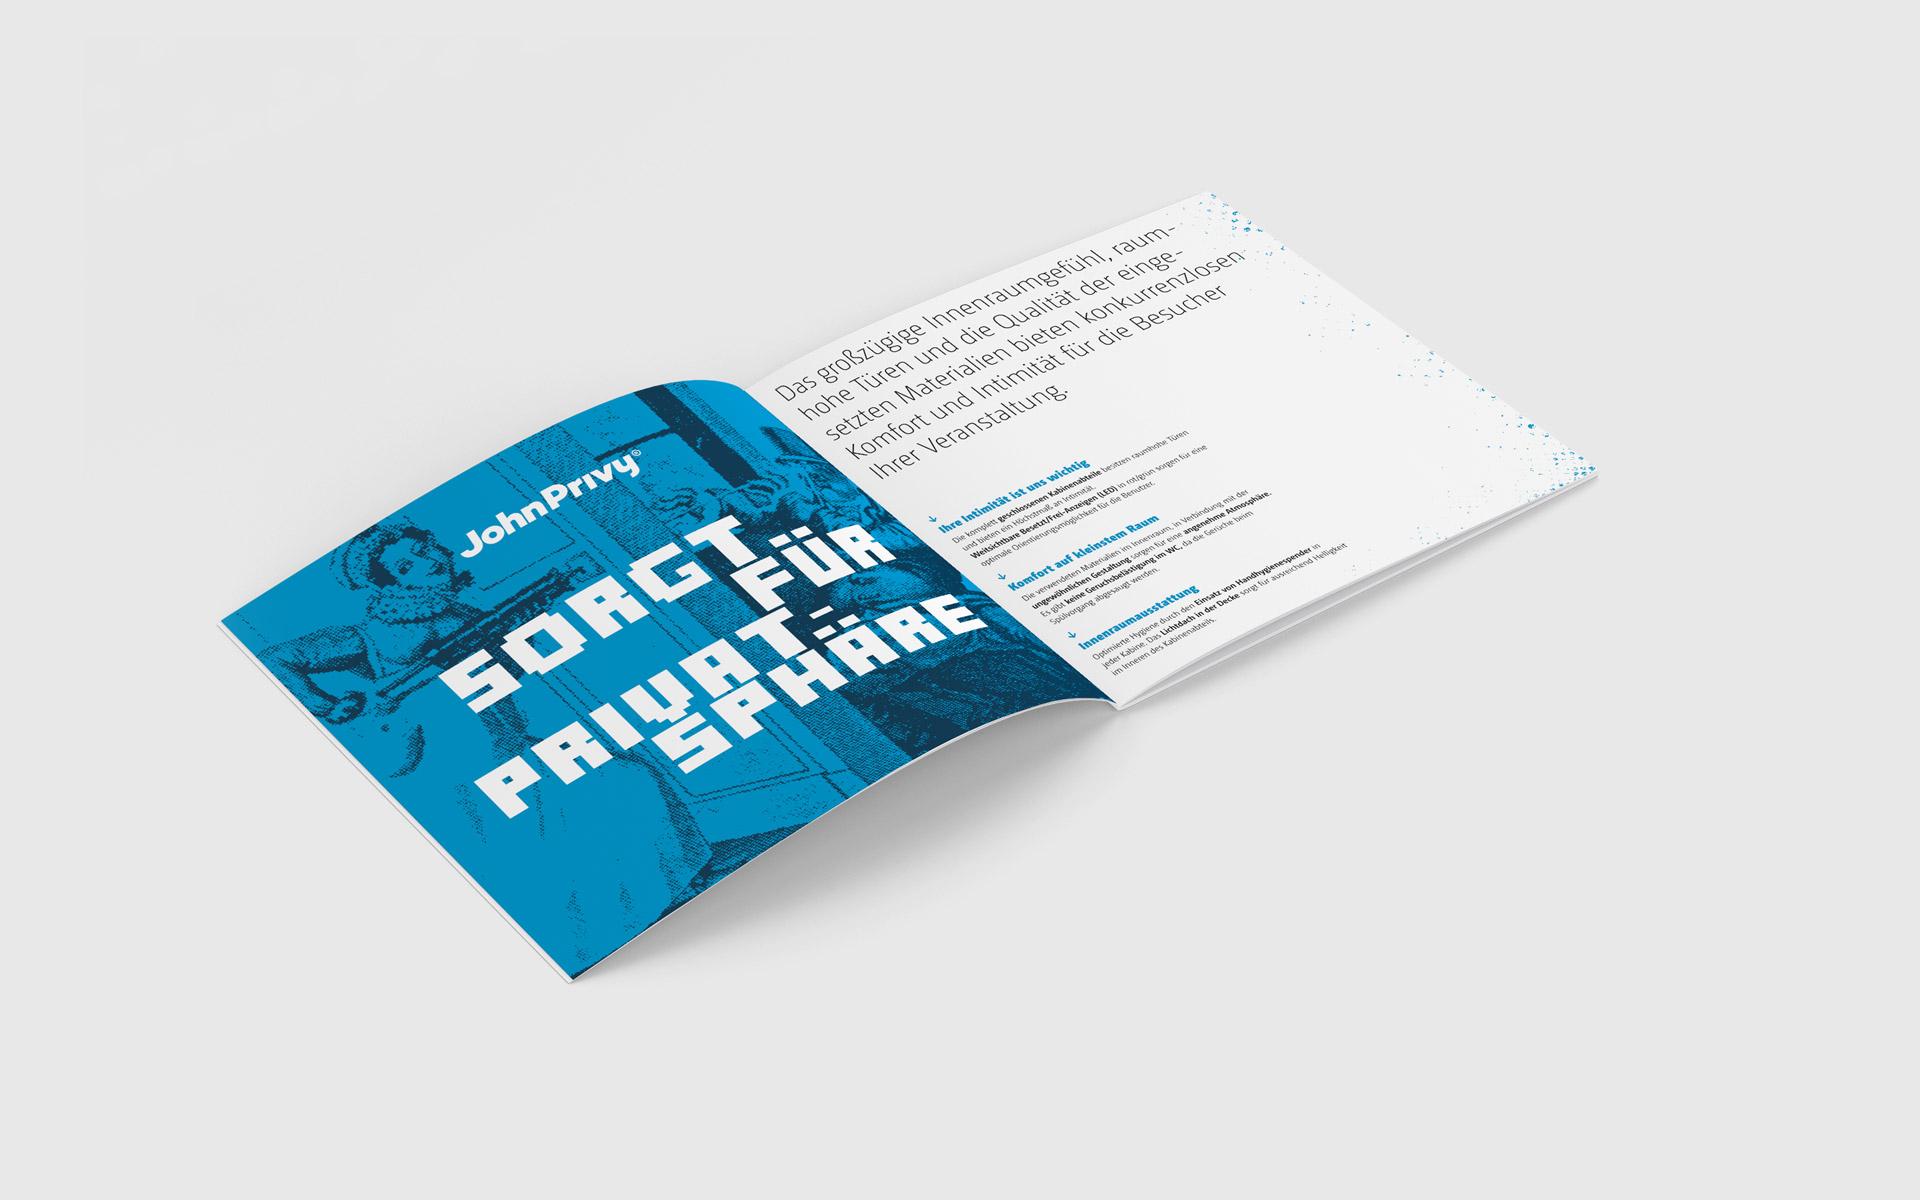 John Privy® Brand Identity, Logotype, Corporate Design Entwicklung, Broschürendesign